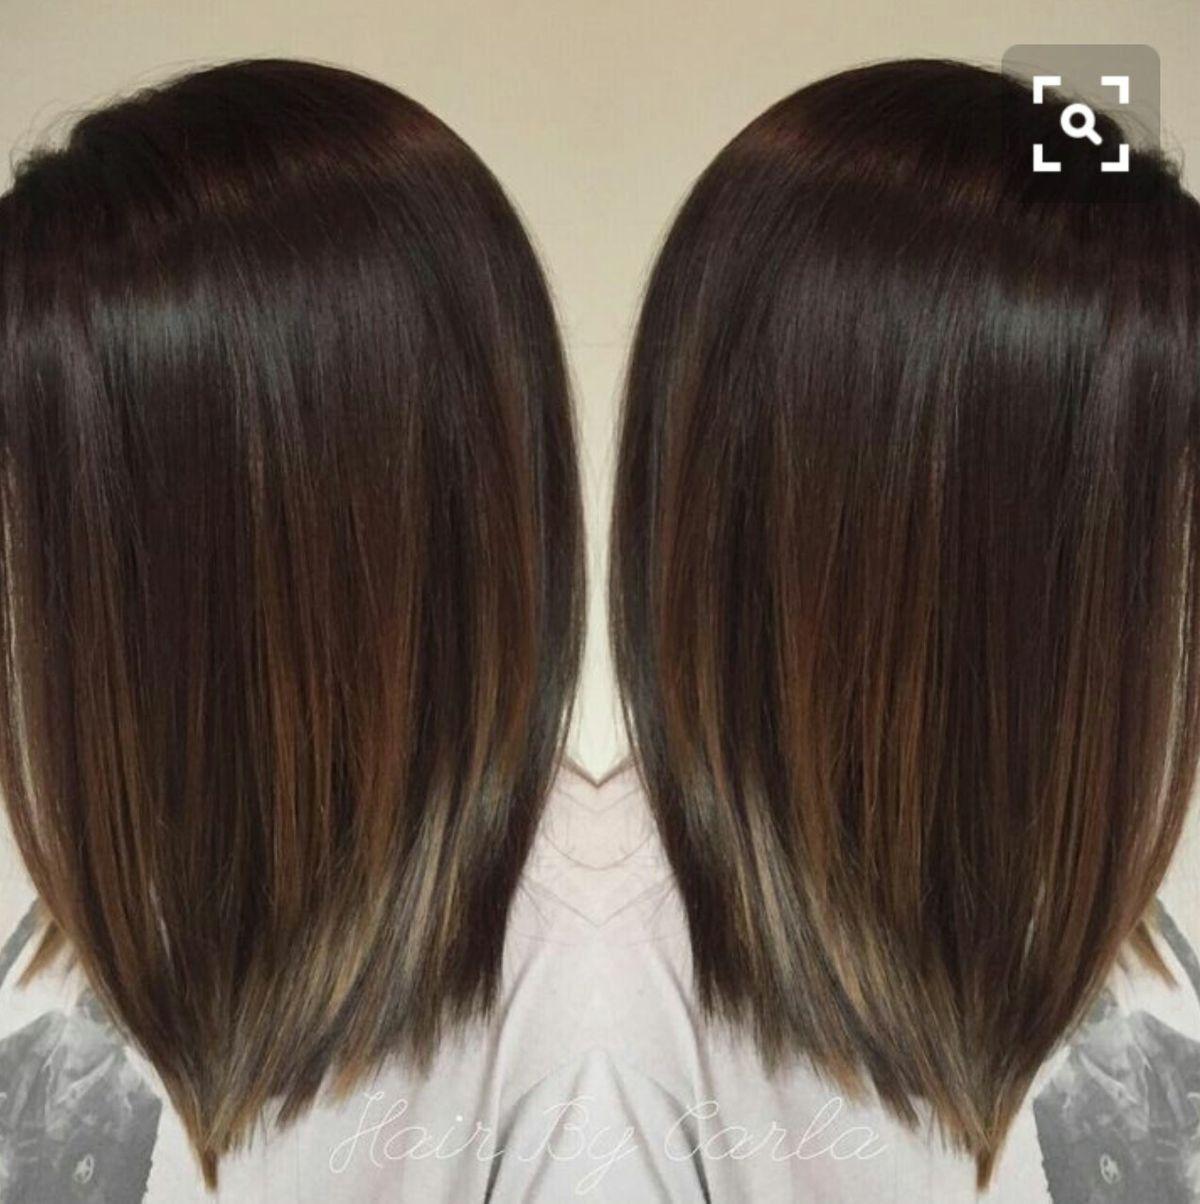 Short Long Straight Hairstyles Straight Medium Length Hairstyles Shoulder Straight Hairstyles Ha In 2020 Shoulder Hair Medium Length Hair Straight Long Hair Styles